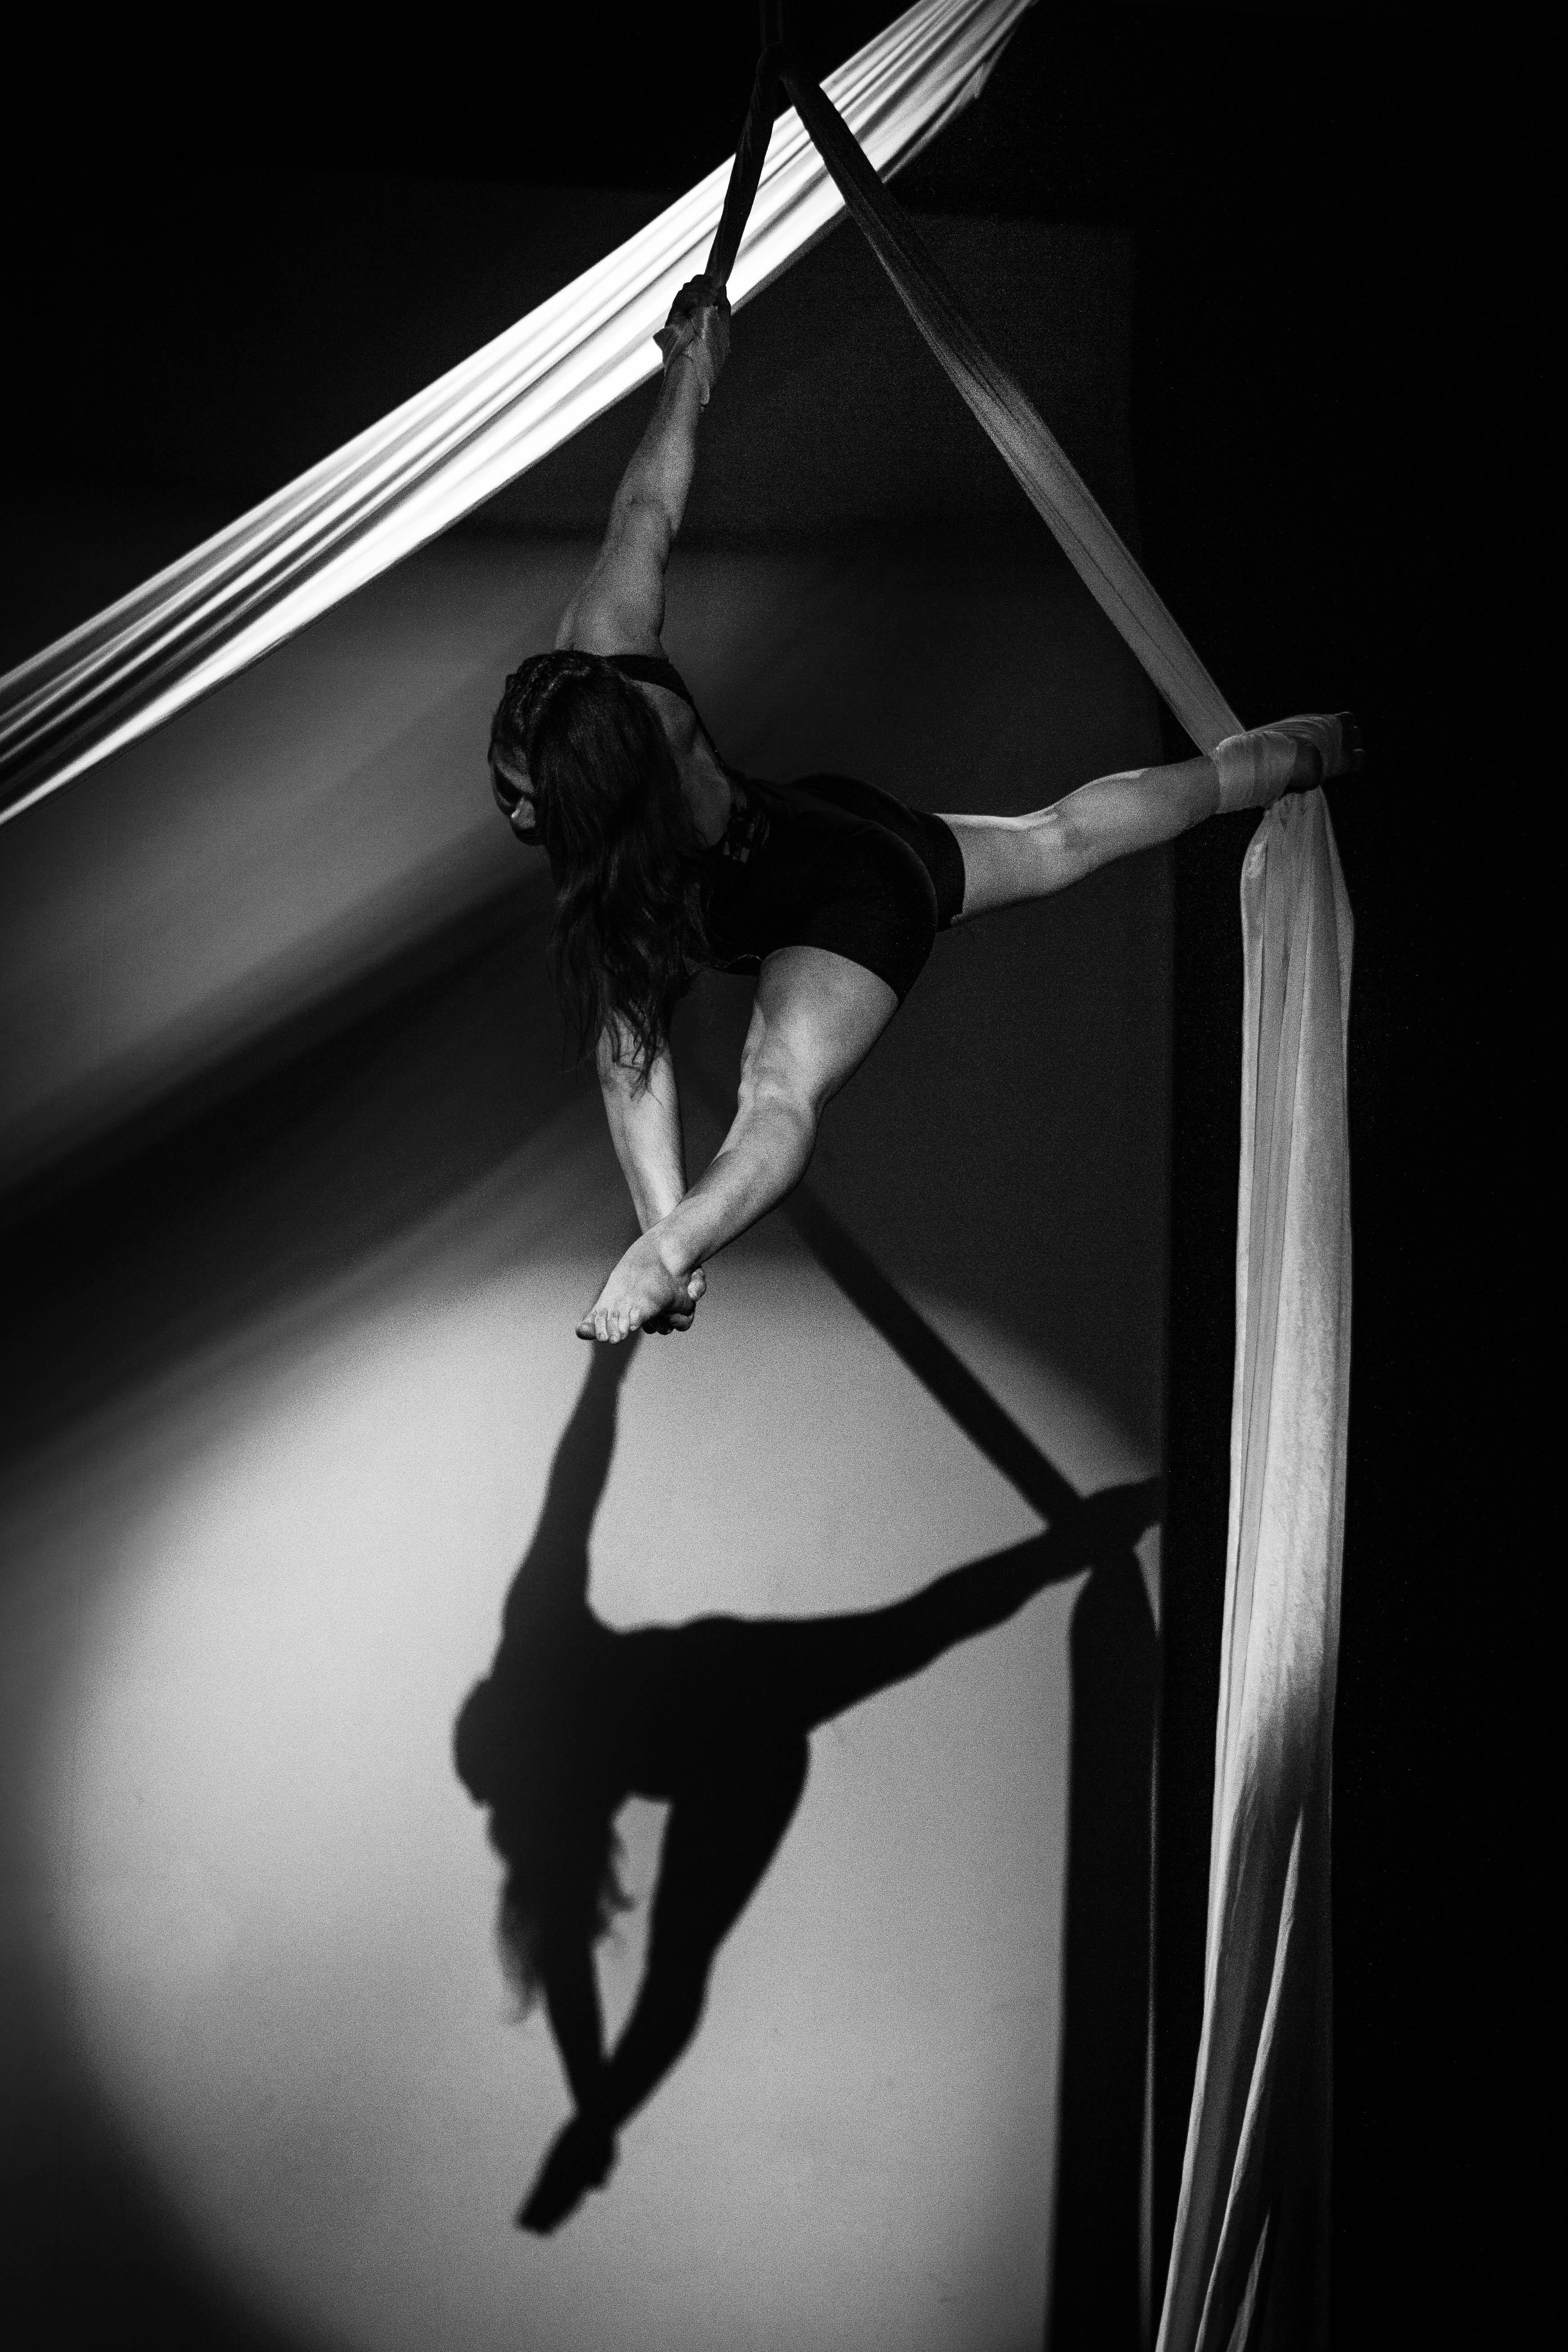 Andrea Cecilia Suarez- Zirkusartist aus Argentinien